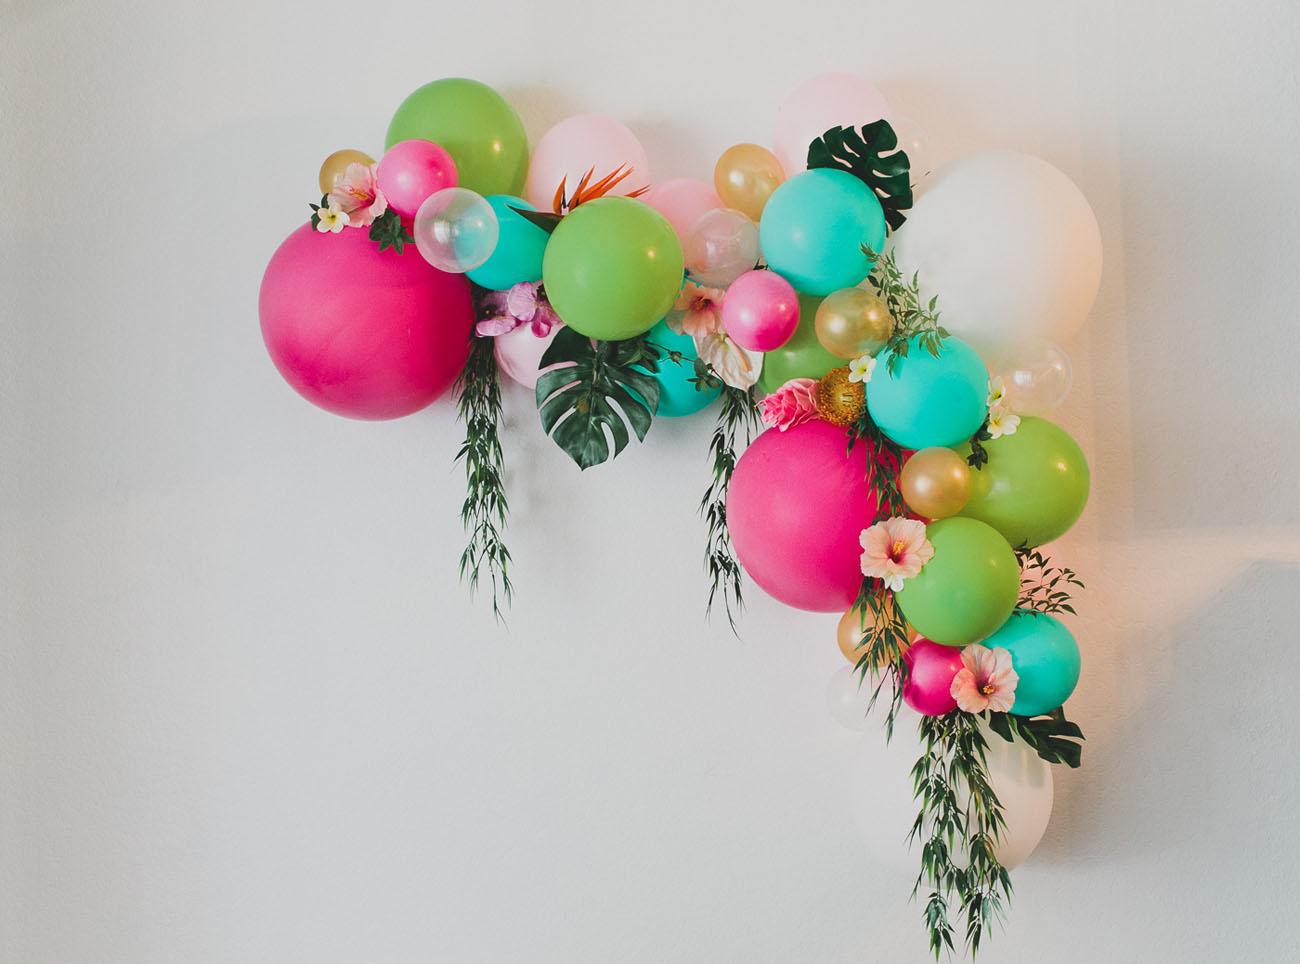 Creative Weekend Links - festive-balloon-arch